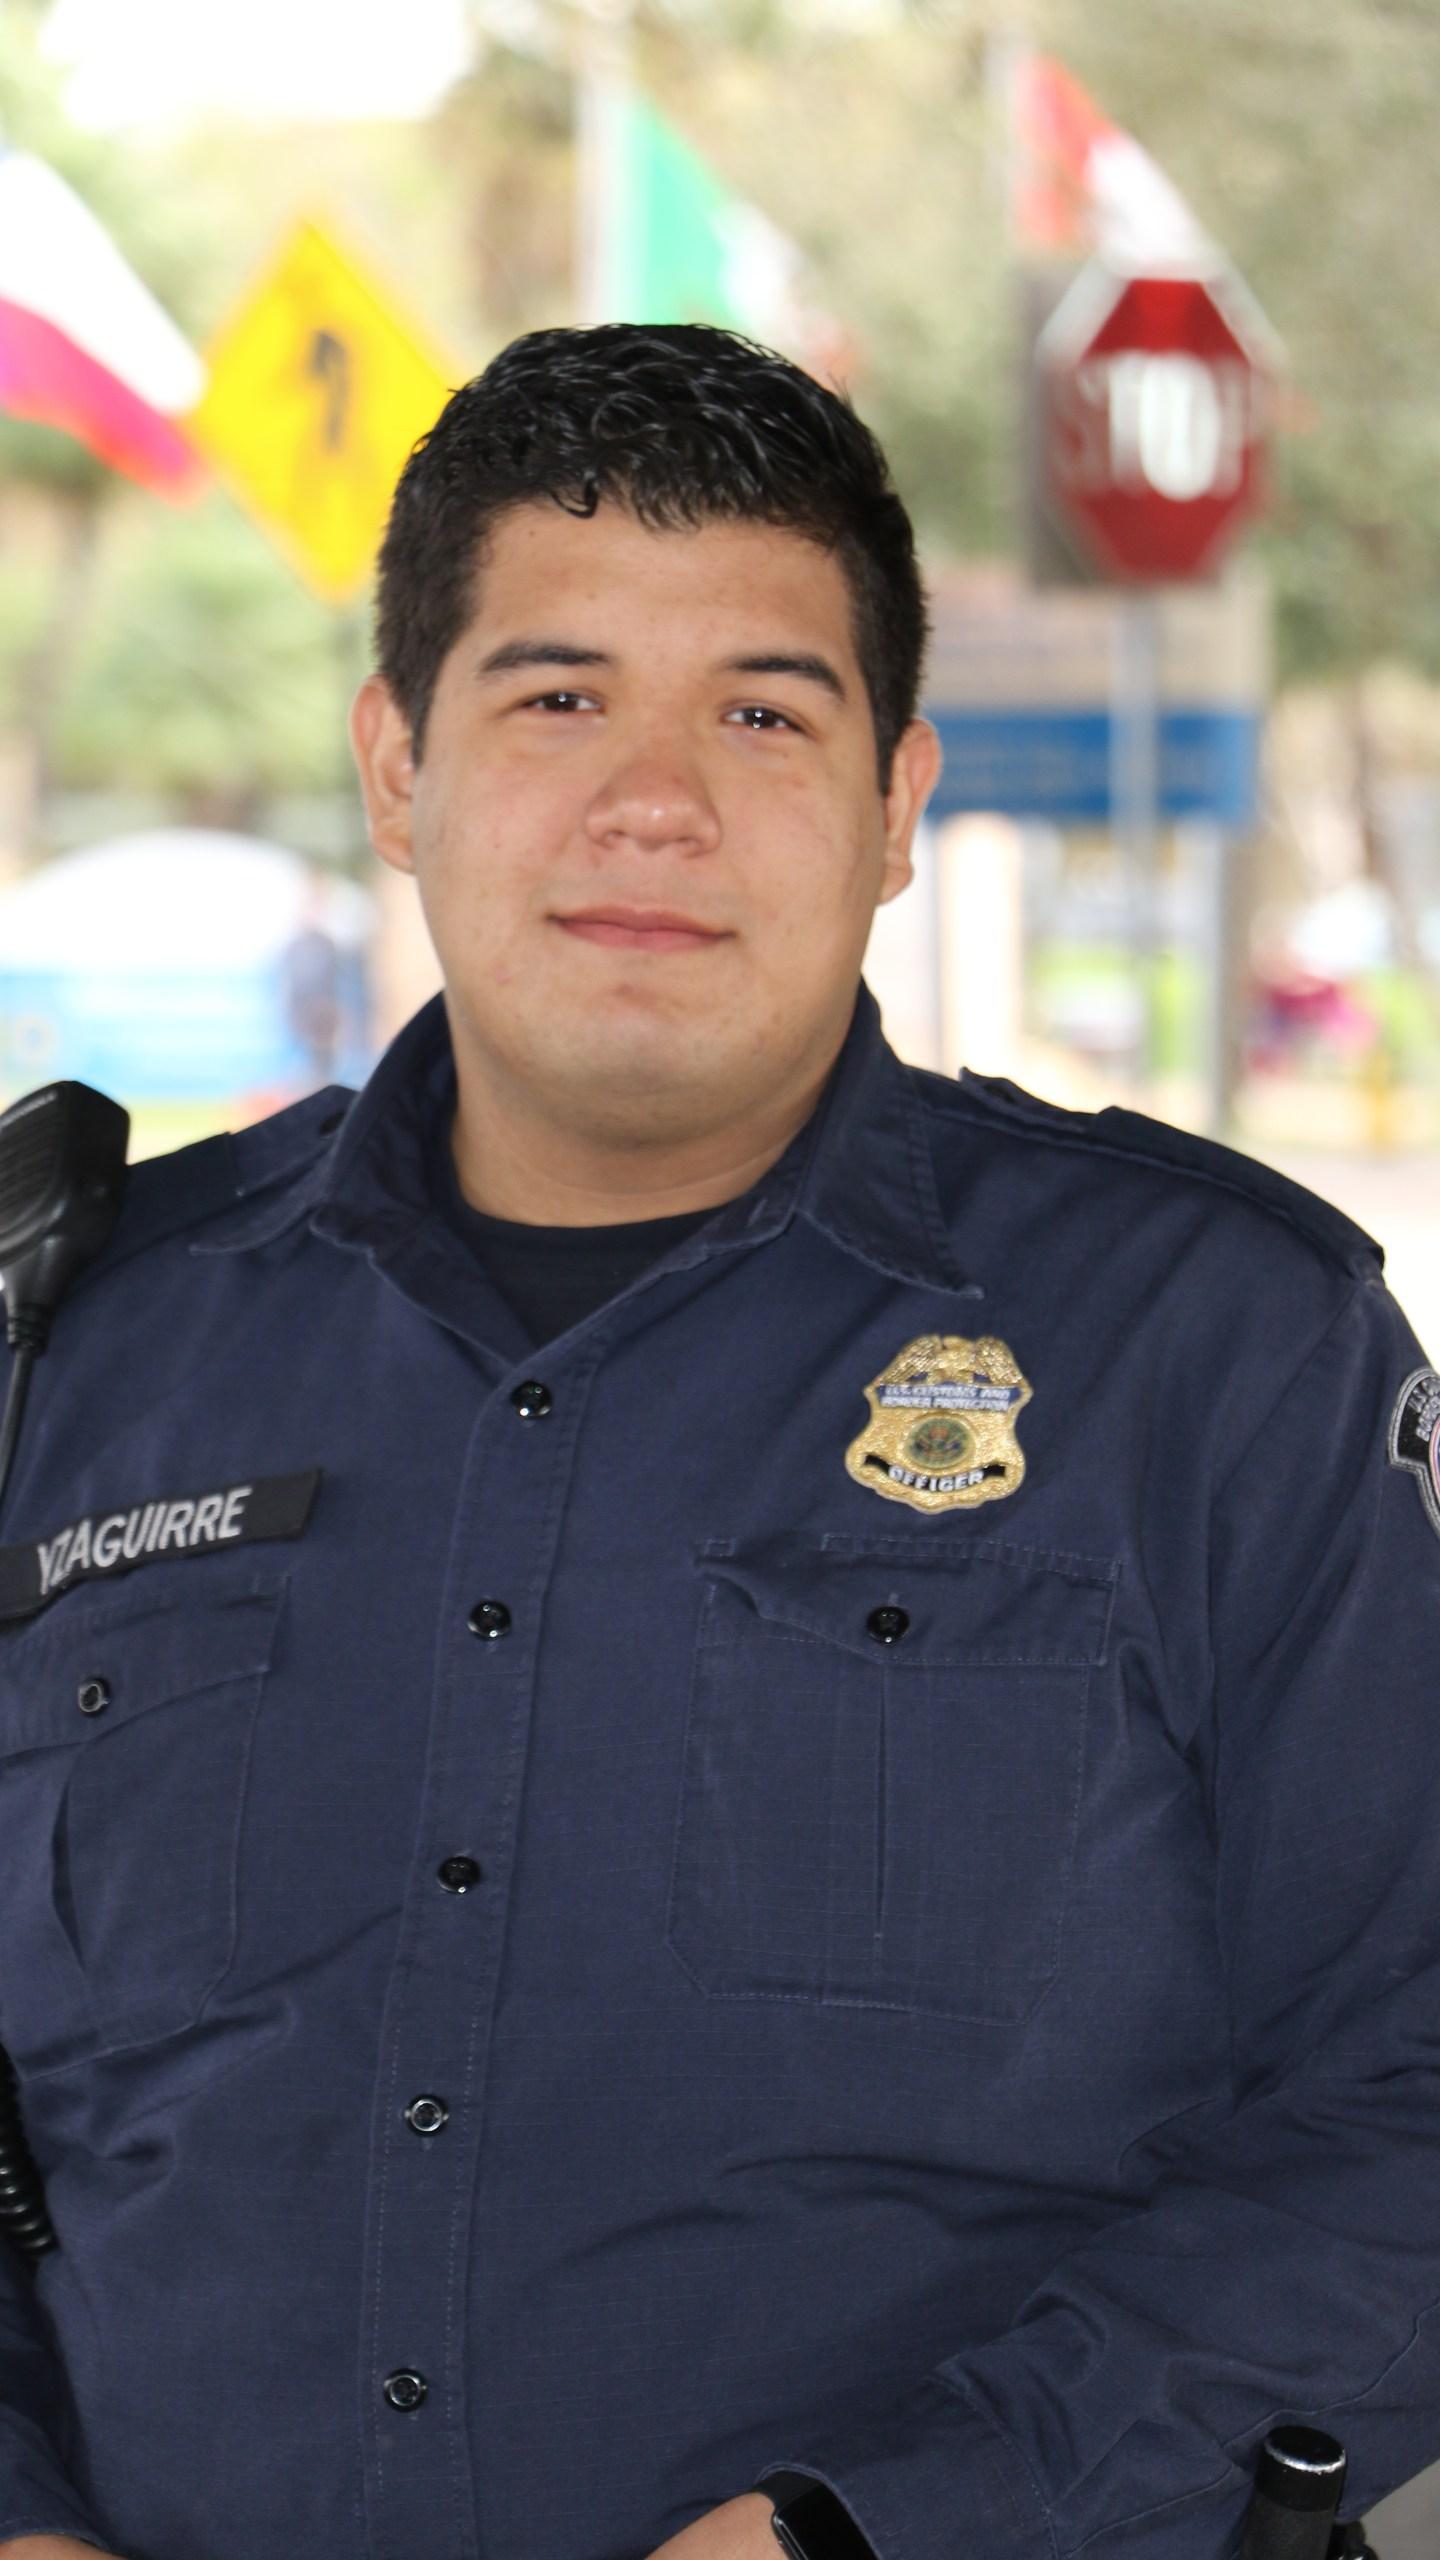 CBP Officer Gerardo Yzaguirre_1485451634148.JPG